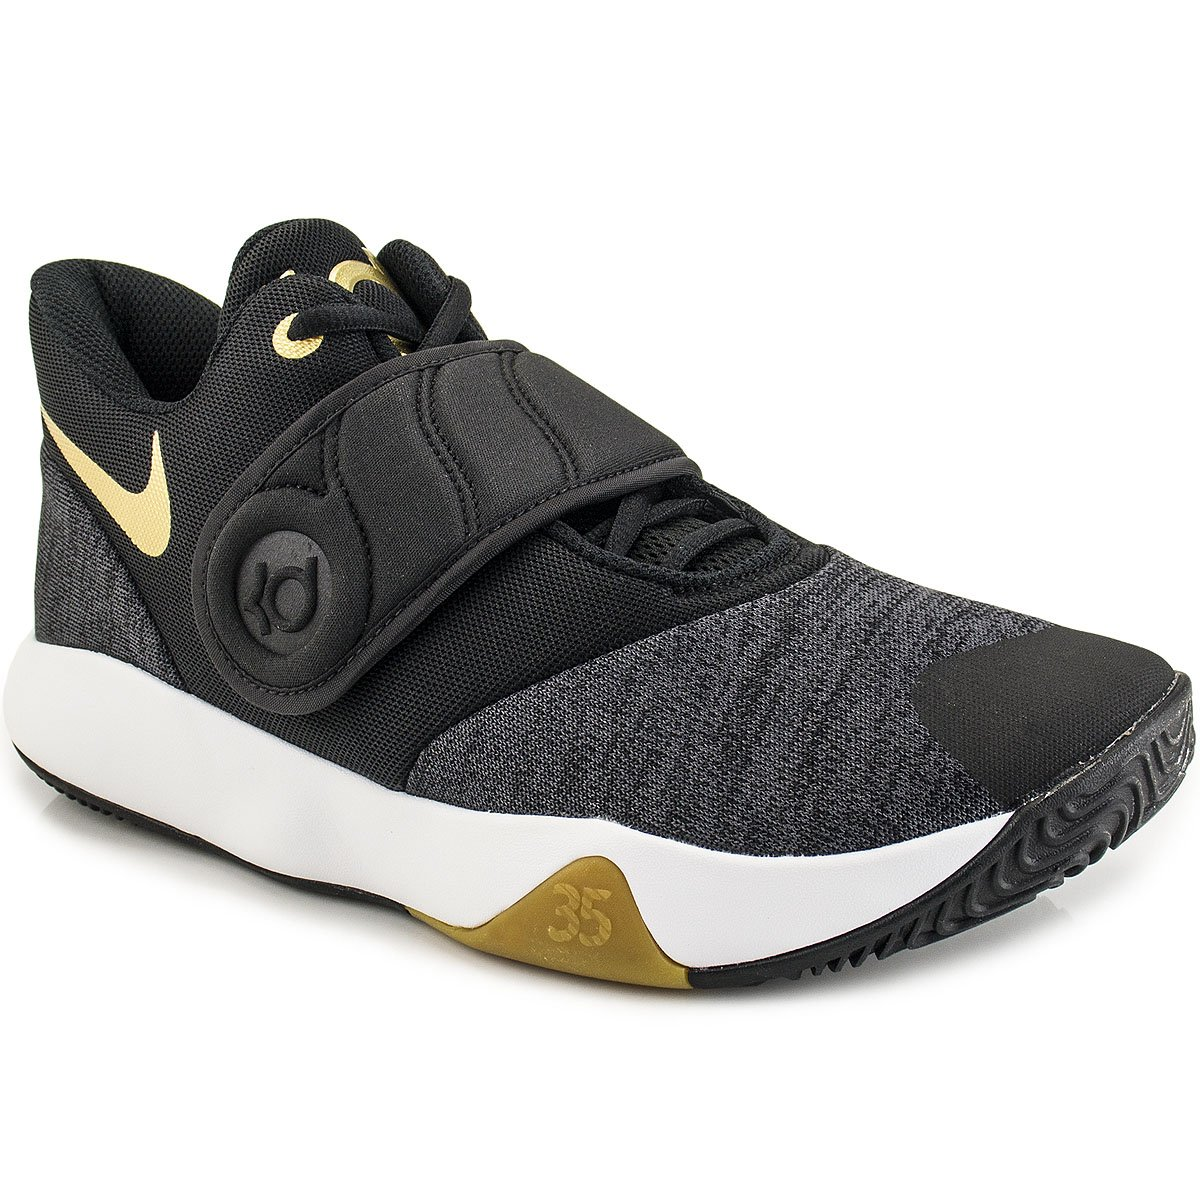 Tênis Nike KD Trey 5 VI Masculino  833fbe59c76b0